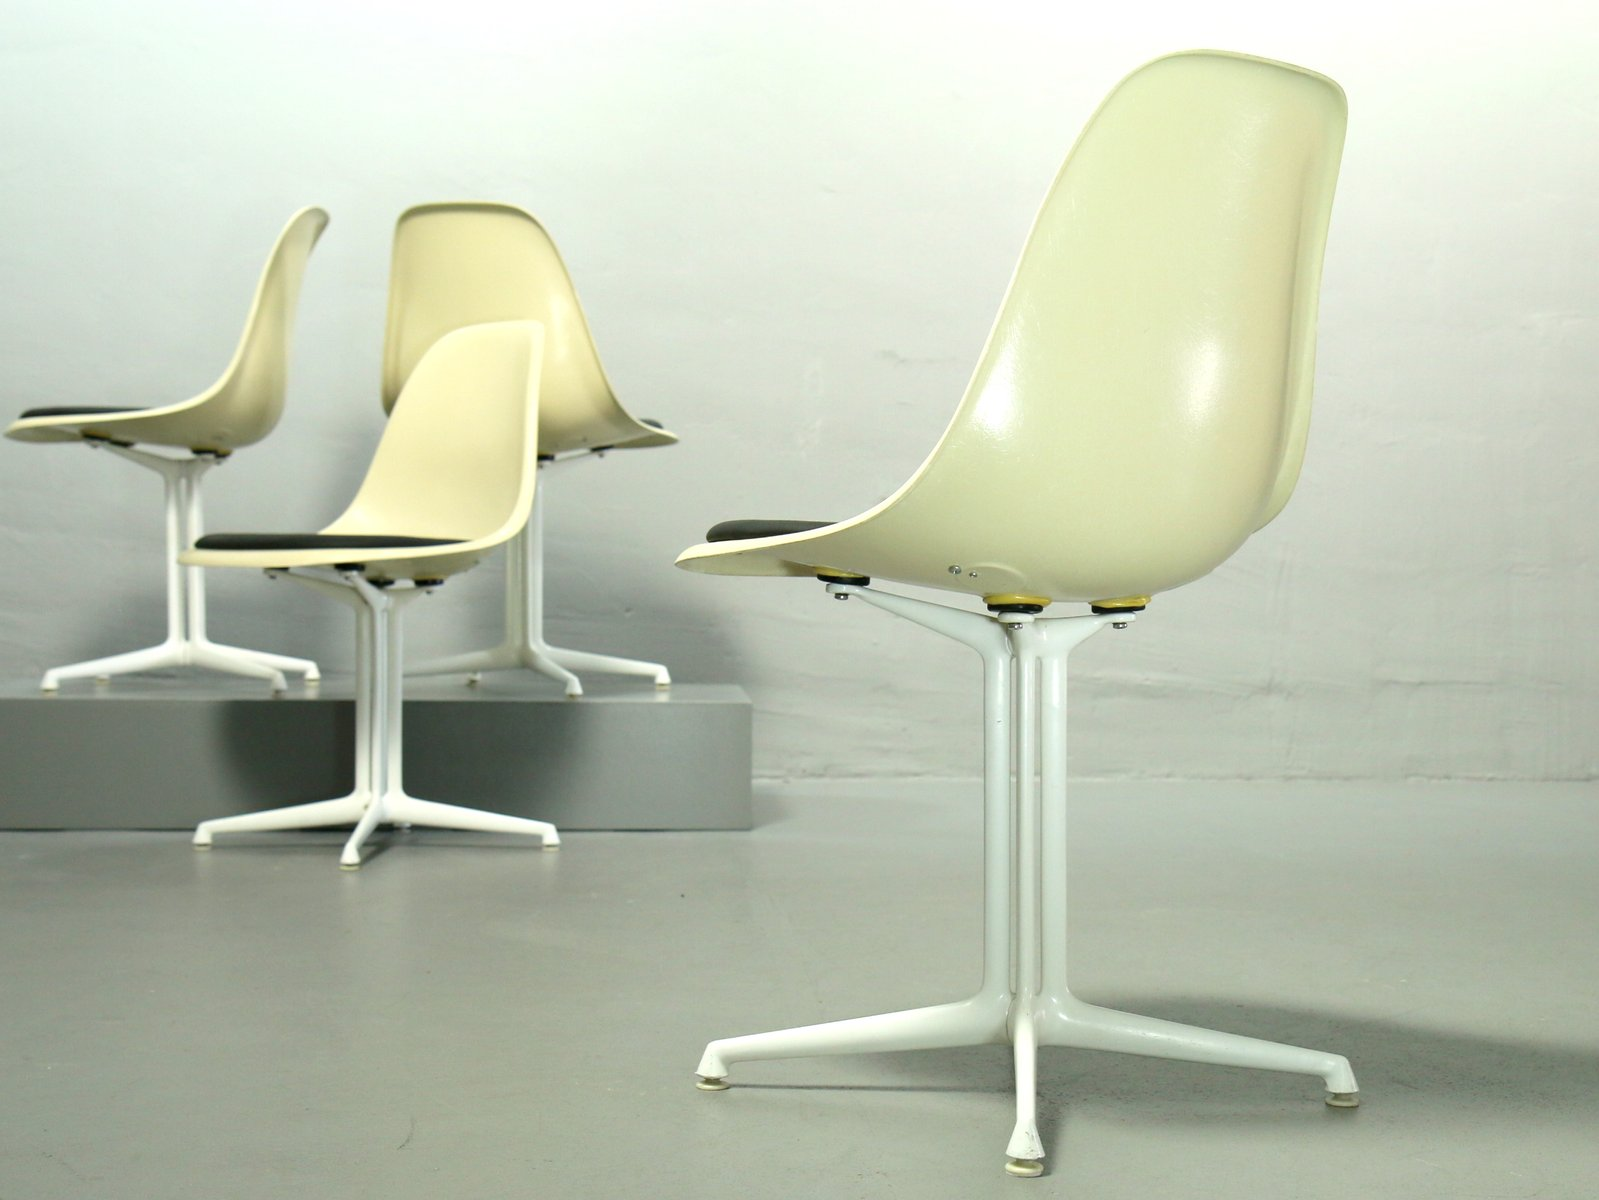 fiberglas st hle von charles ray eames f r vitra 4er set bei pamono kaufen. Black Bedroom Furniture Sets. Home Design Ideas